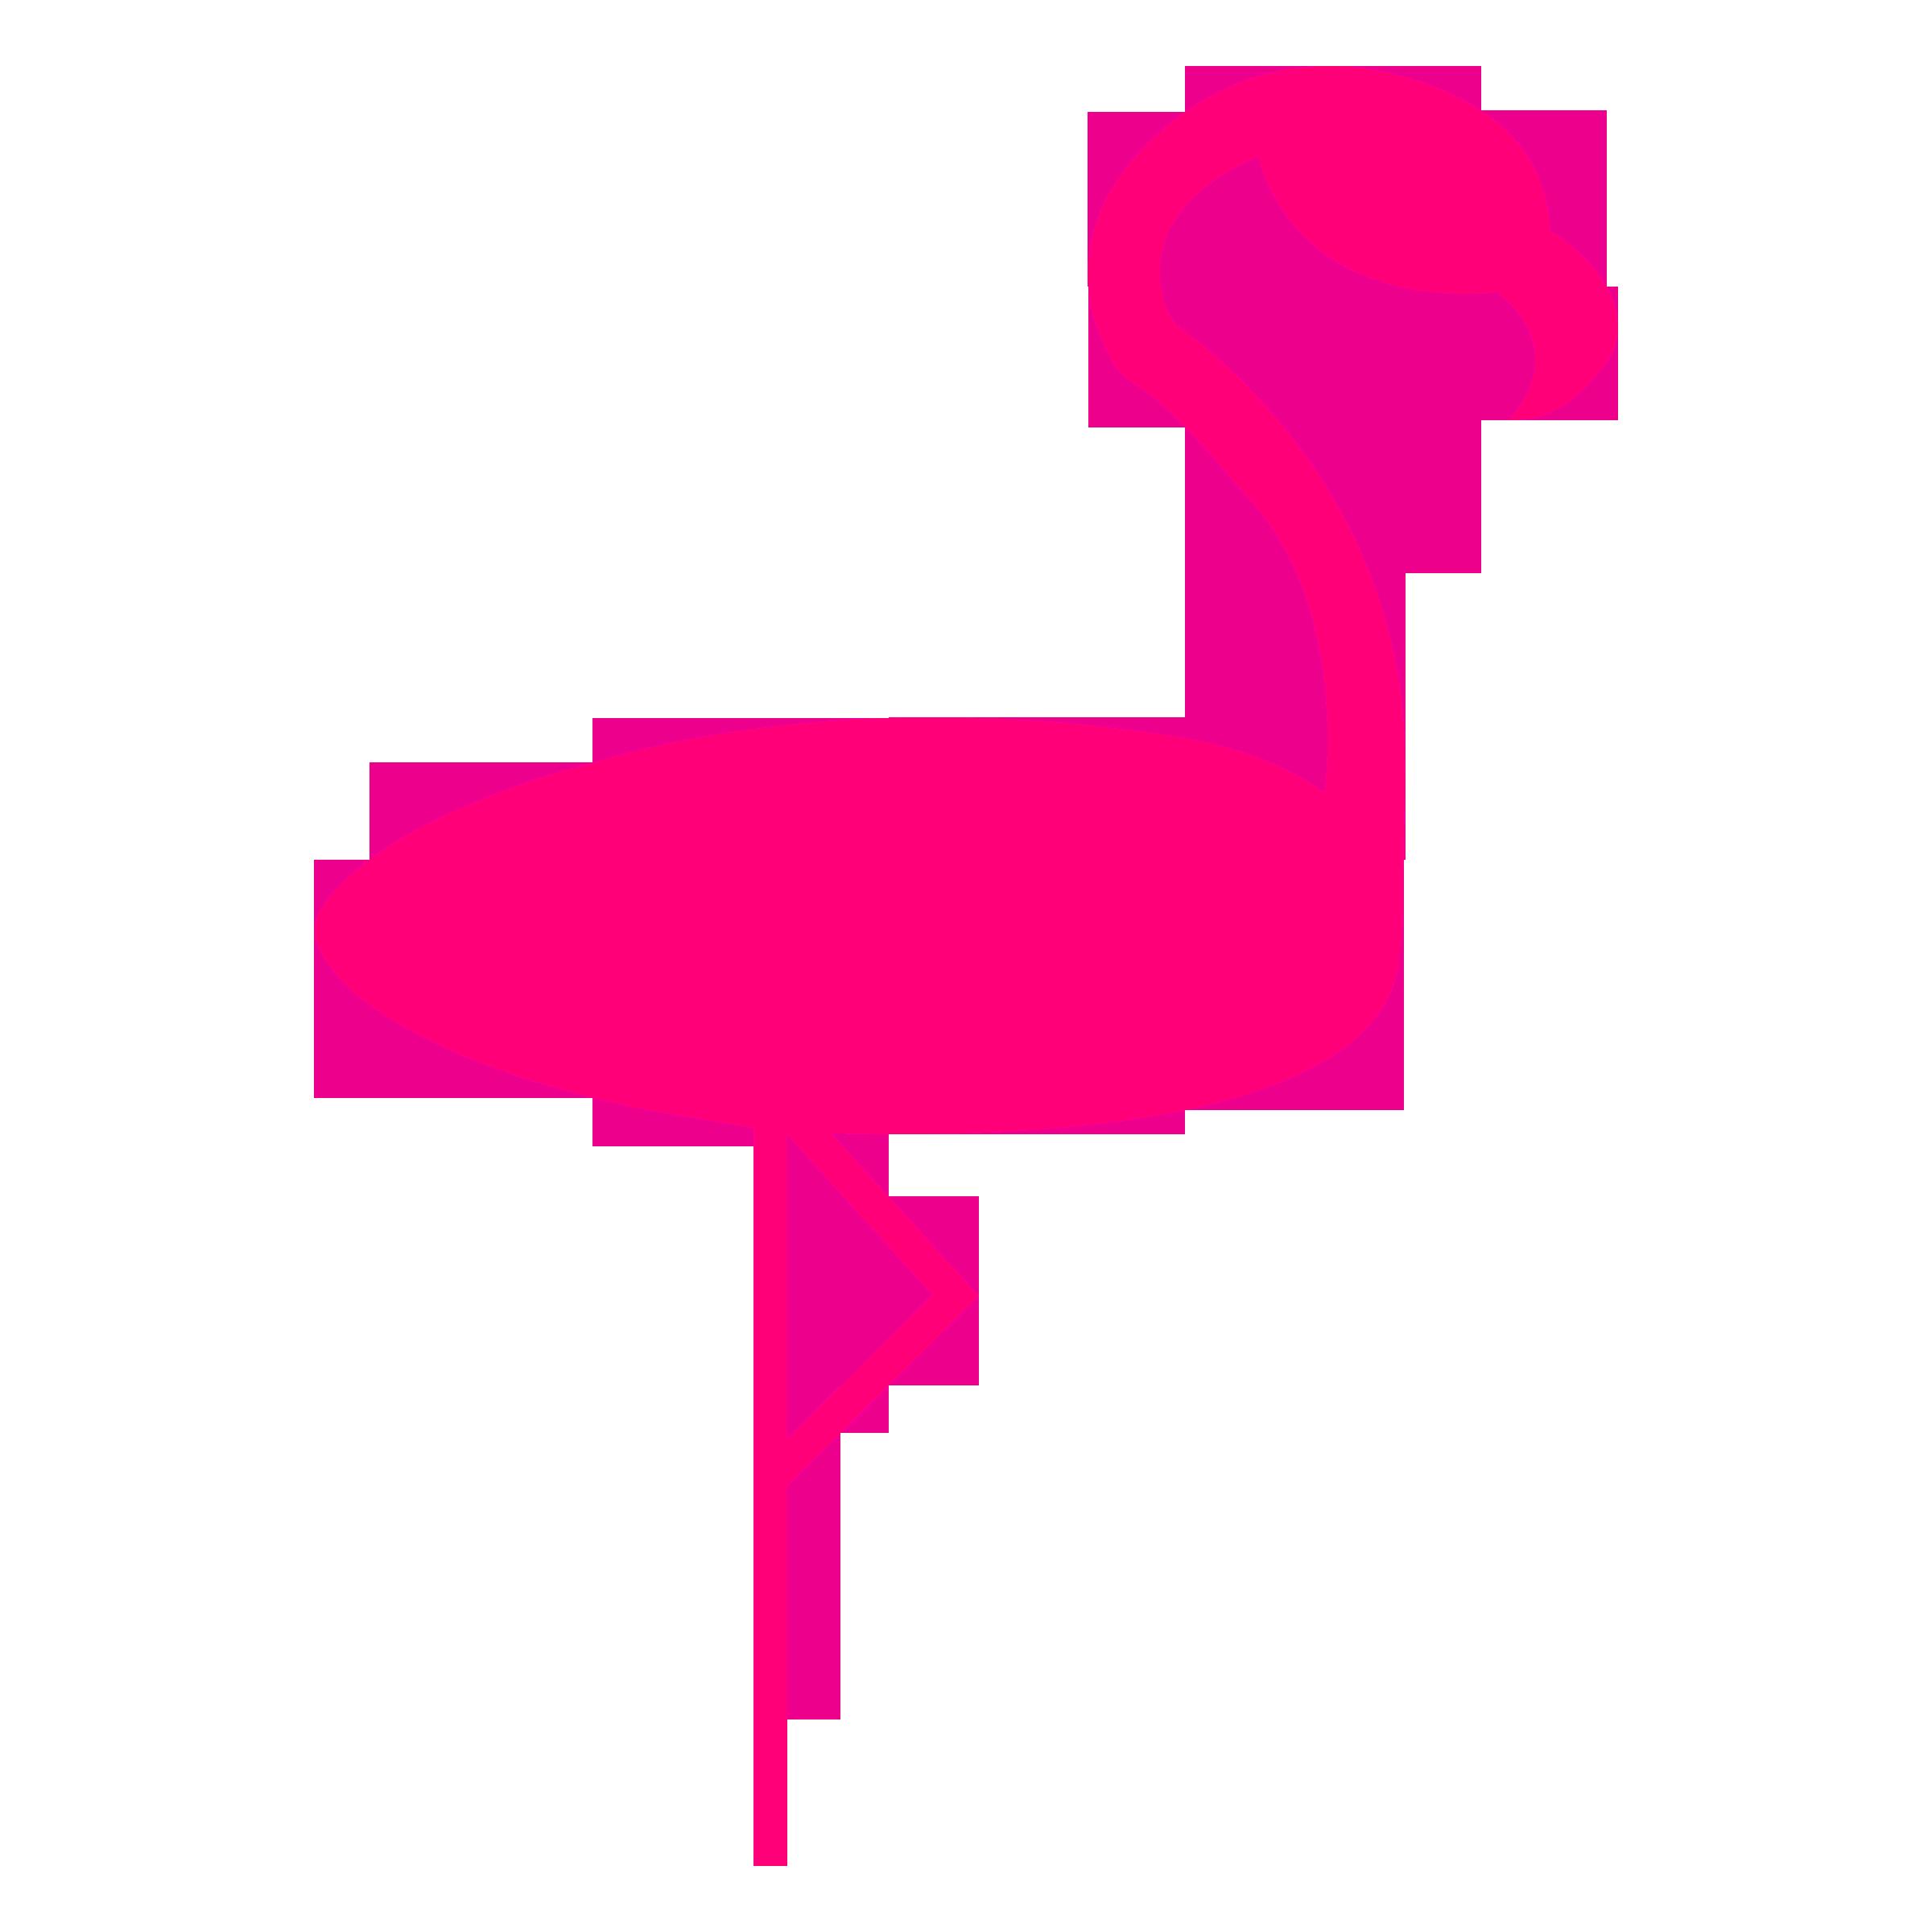 pink-f